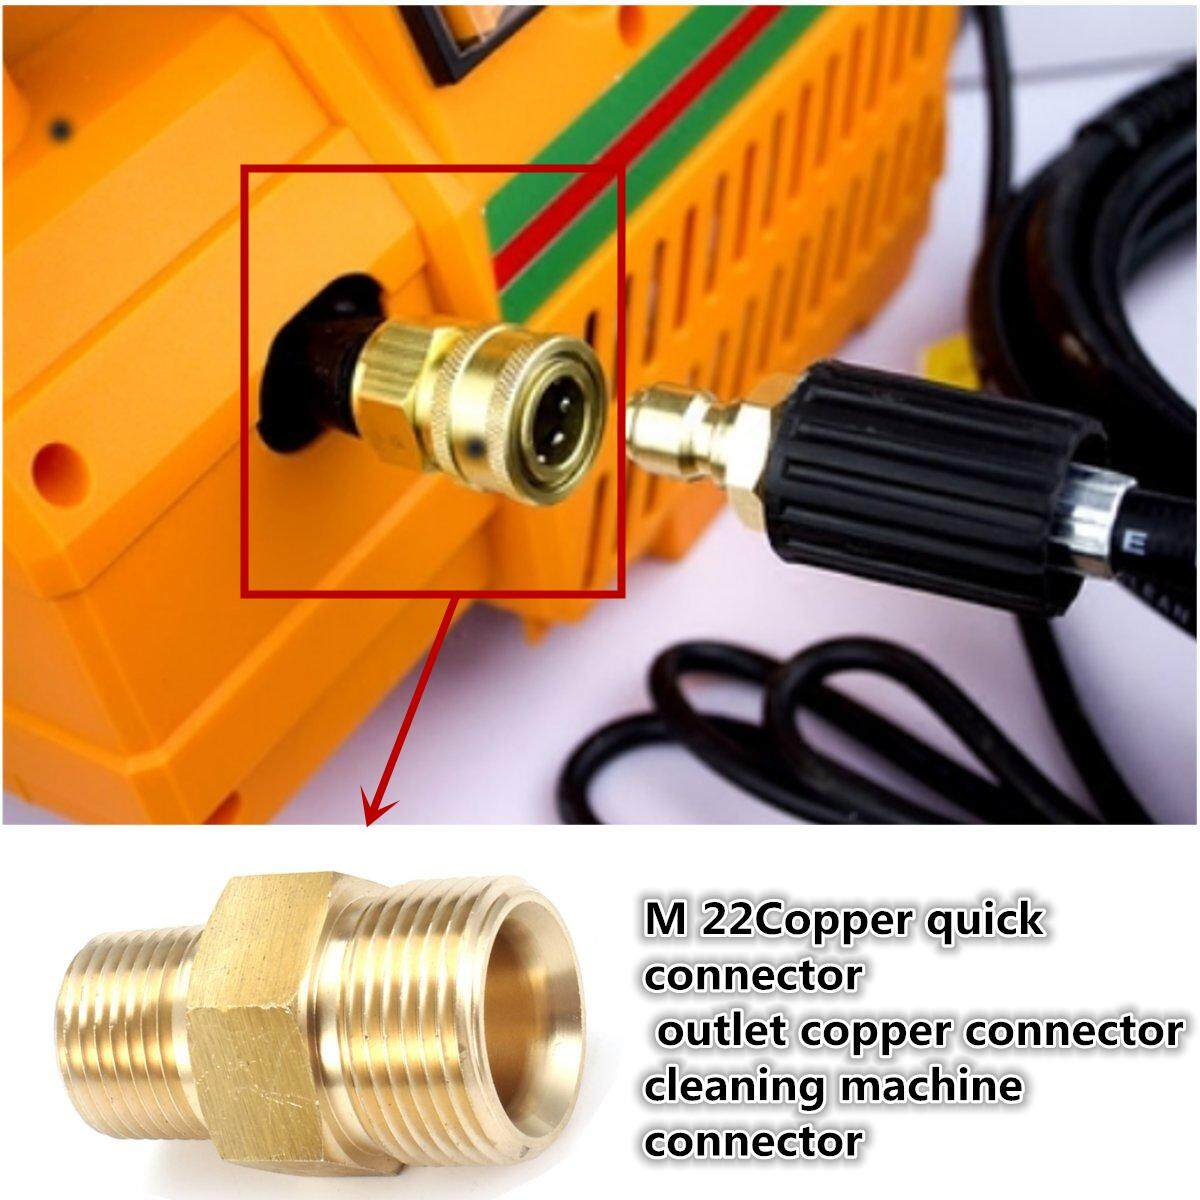 M22 Male to 3/8 NPT Male Pipe Thread Adapter 14mm Inside Diameter